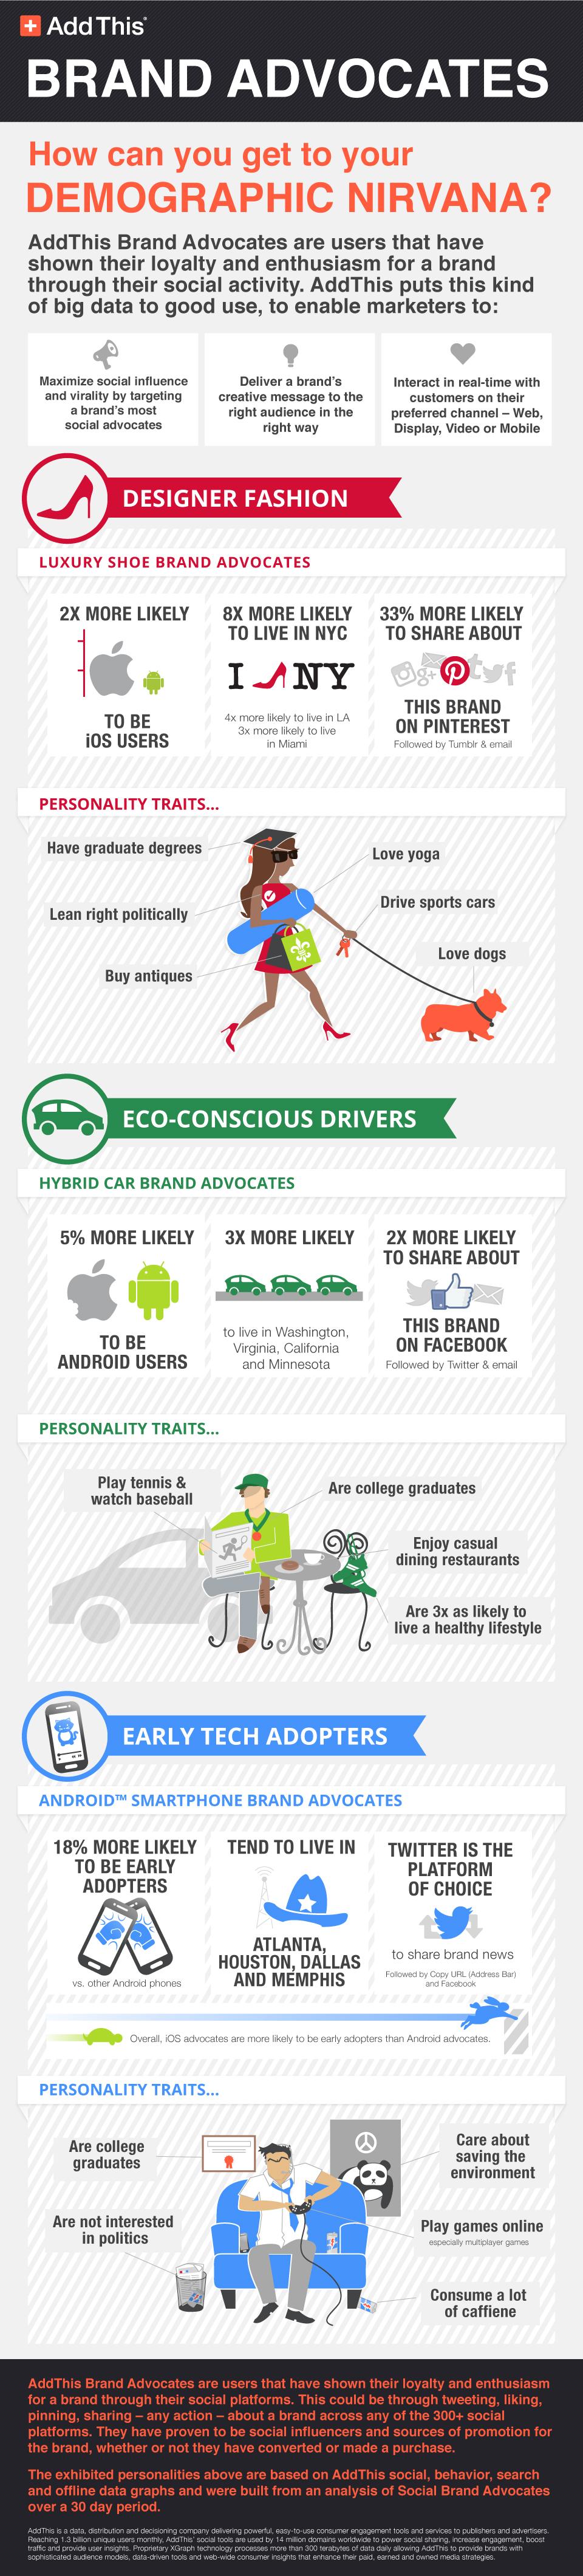 AddThis Brand Advocates Infographic v3